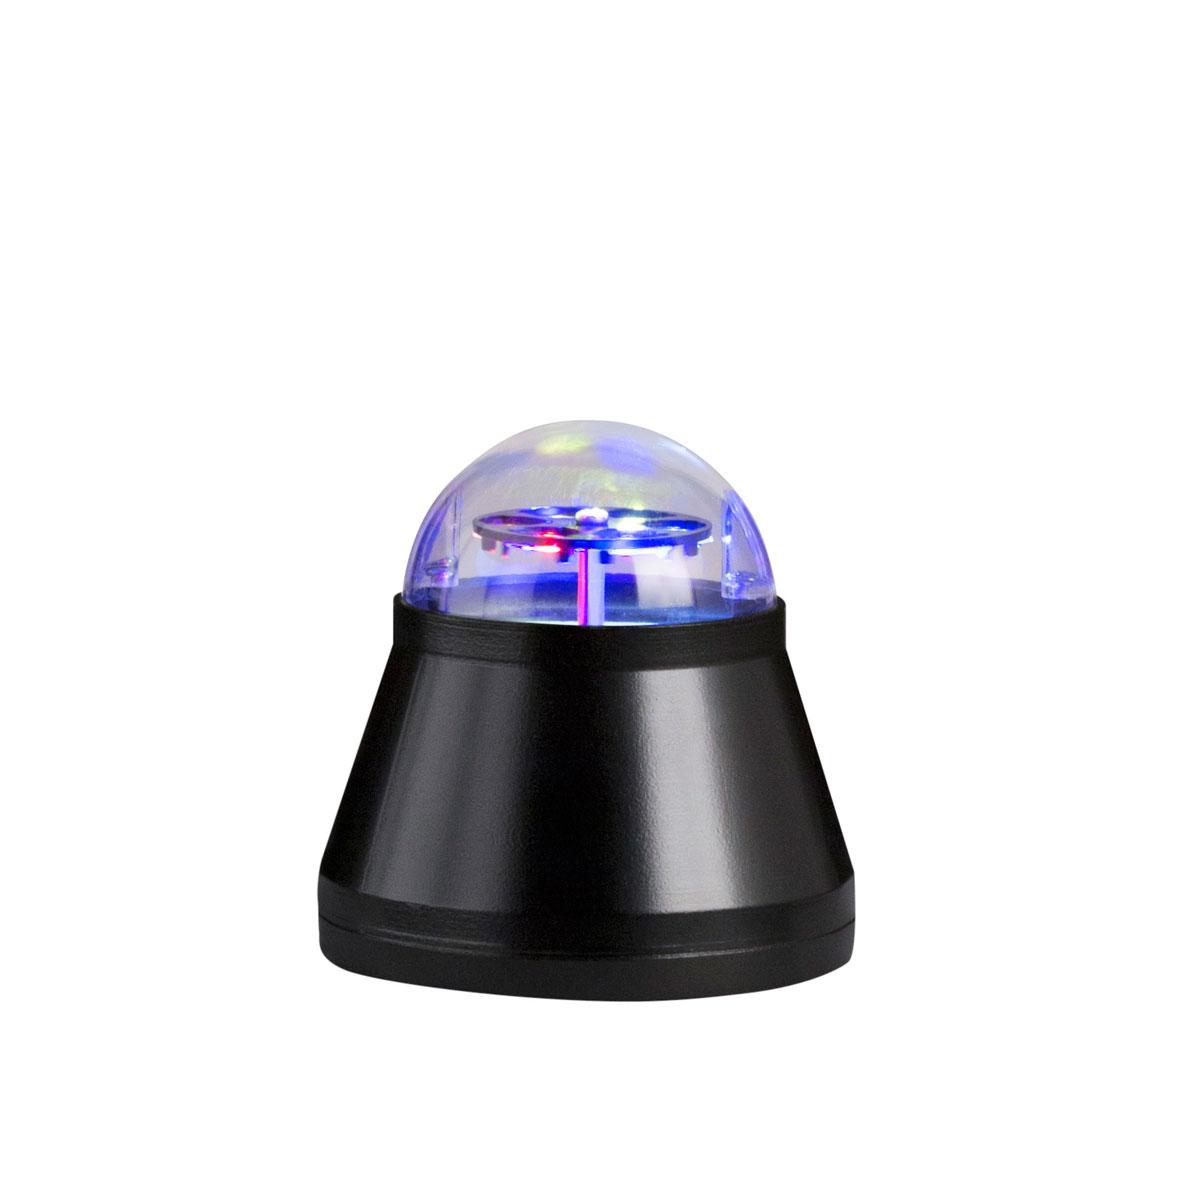 "Dekoleuchten - LED Dekoleuchte ""Halloween"", schwarz  - Onlineshop Hellweg"